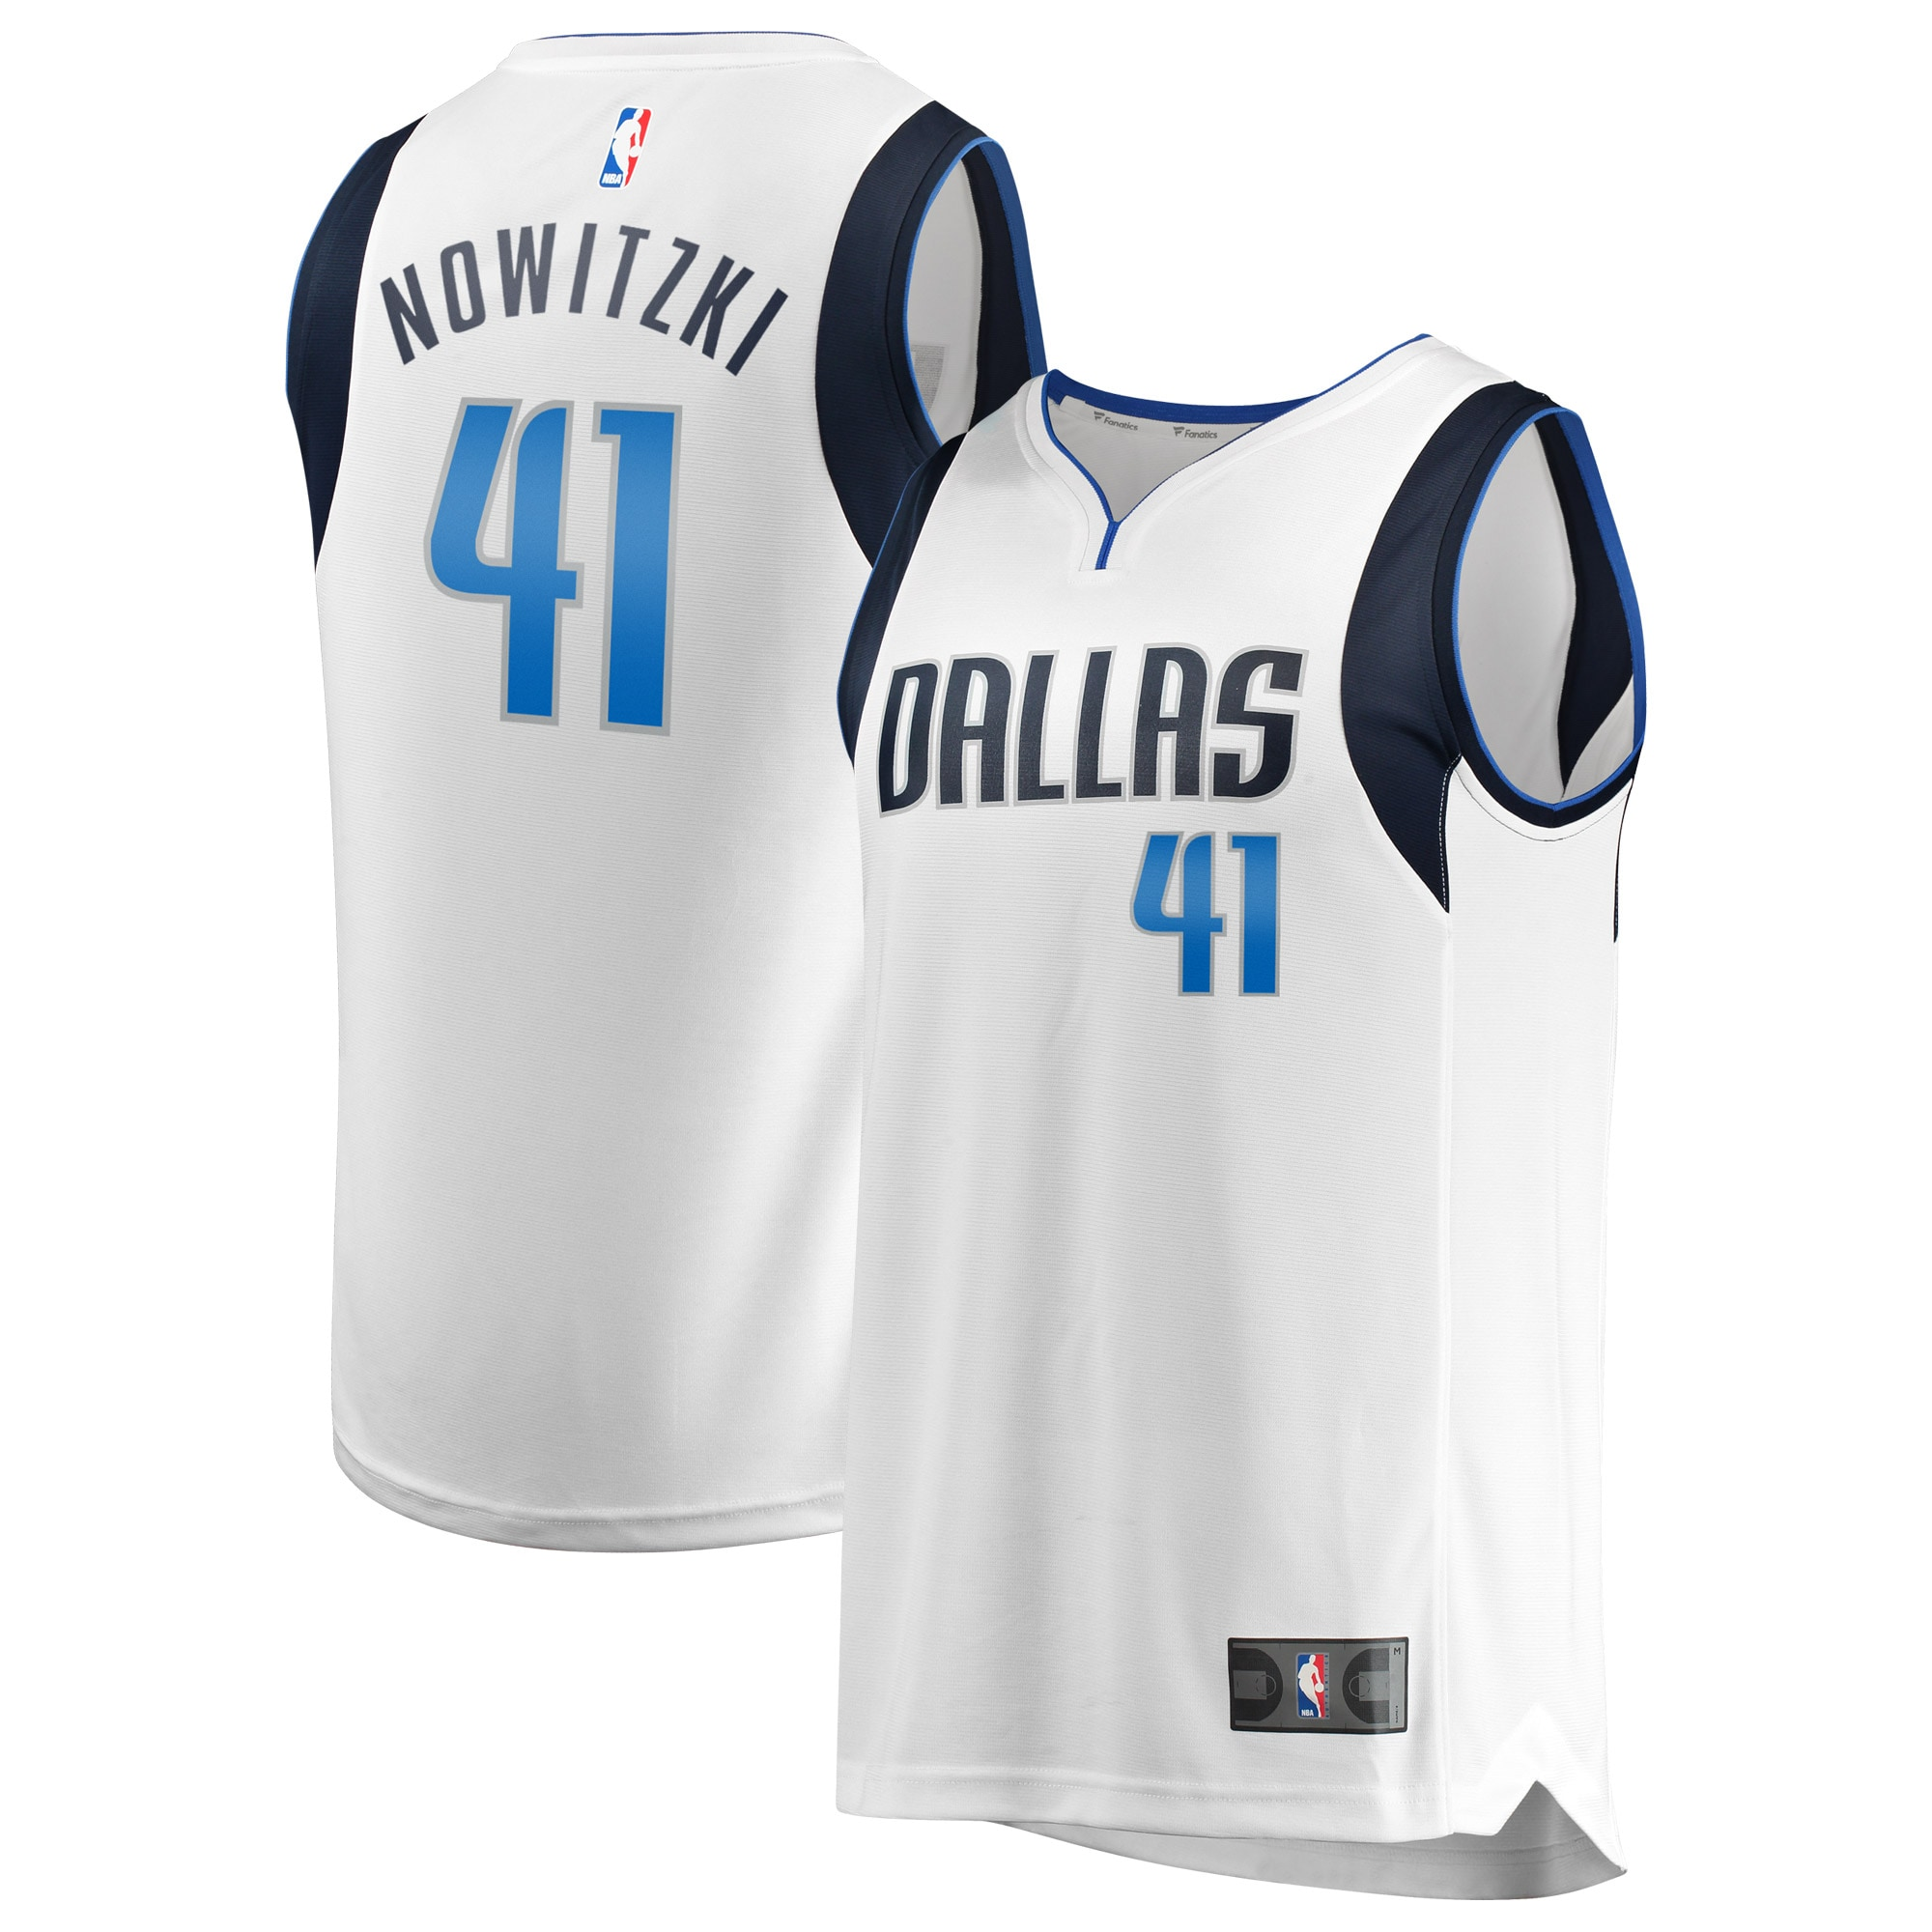 Dirk Nowitzki Dallas Mavericks Fanatics Branded Fast Break Replica Jersey White - Association Edition